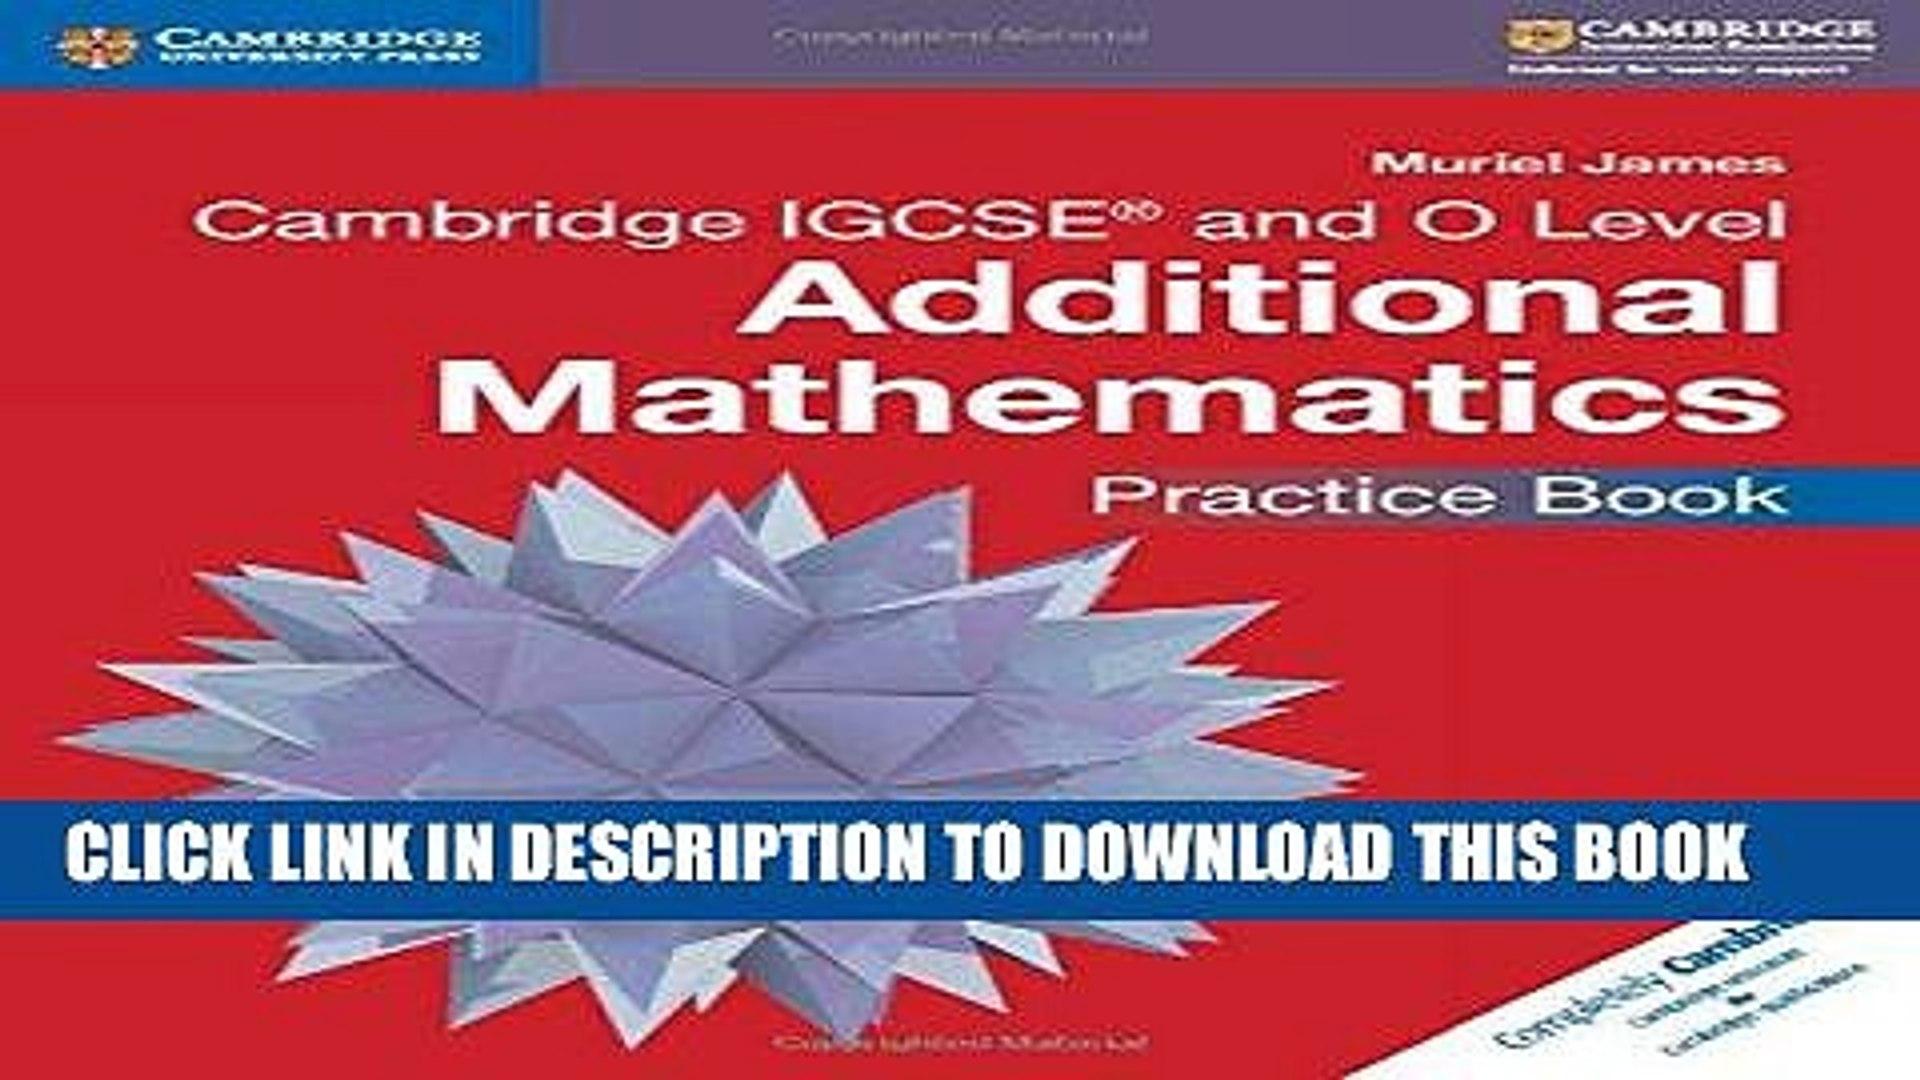 [New] Ebook Cambridge IGCSE® and O Level Additional Mathematics Practice  Book (Cambridge